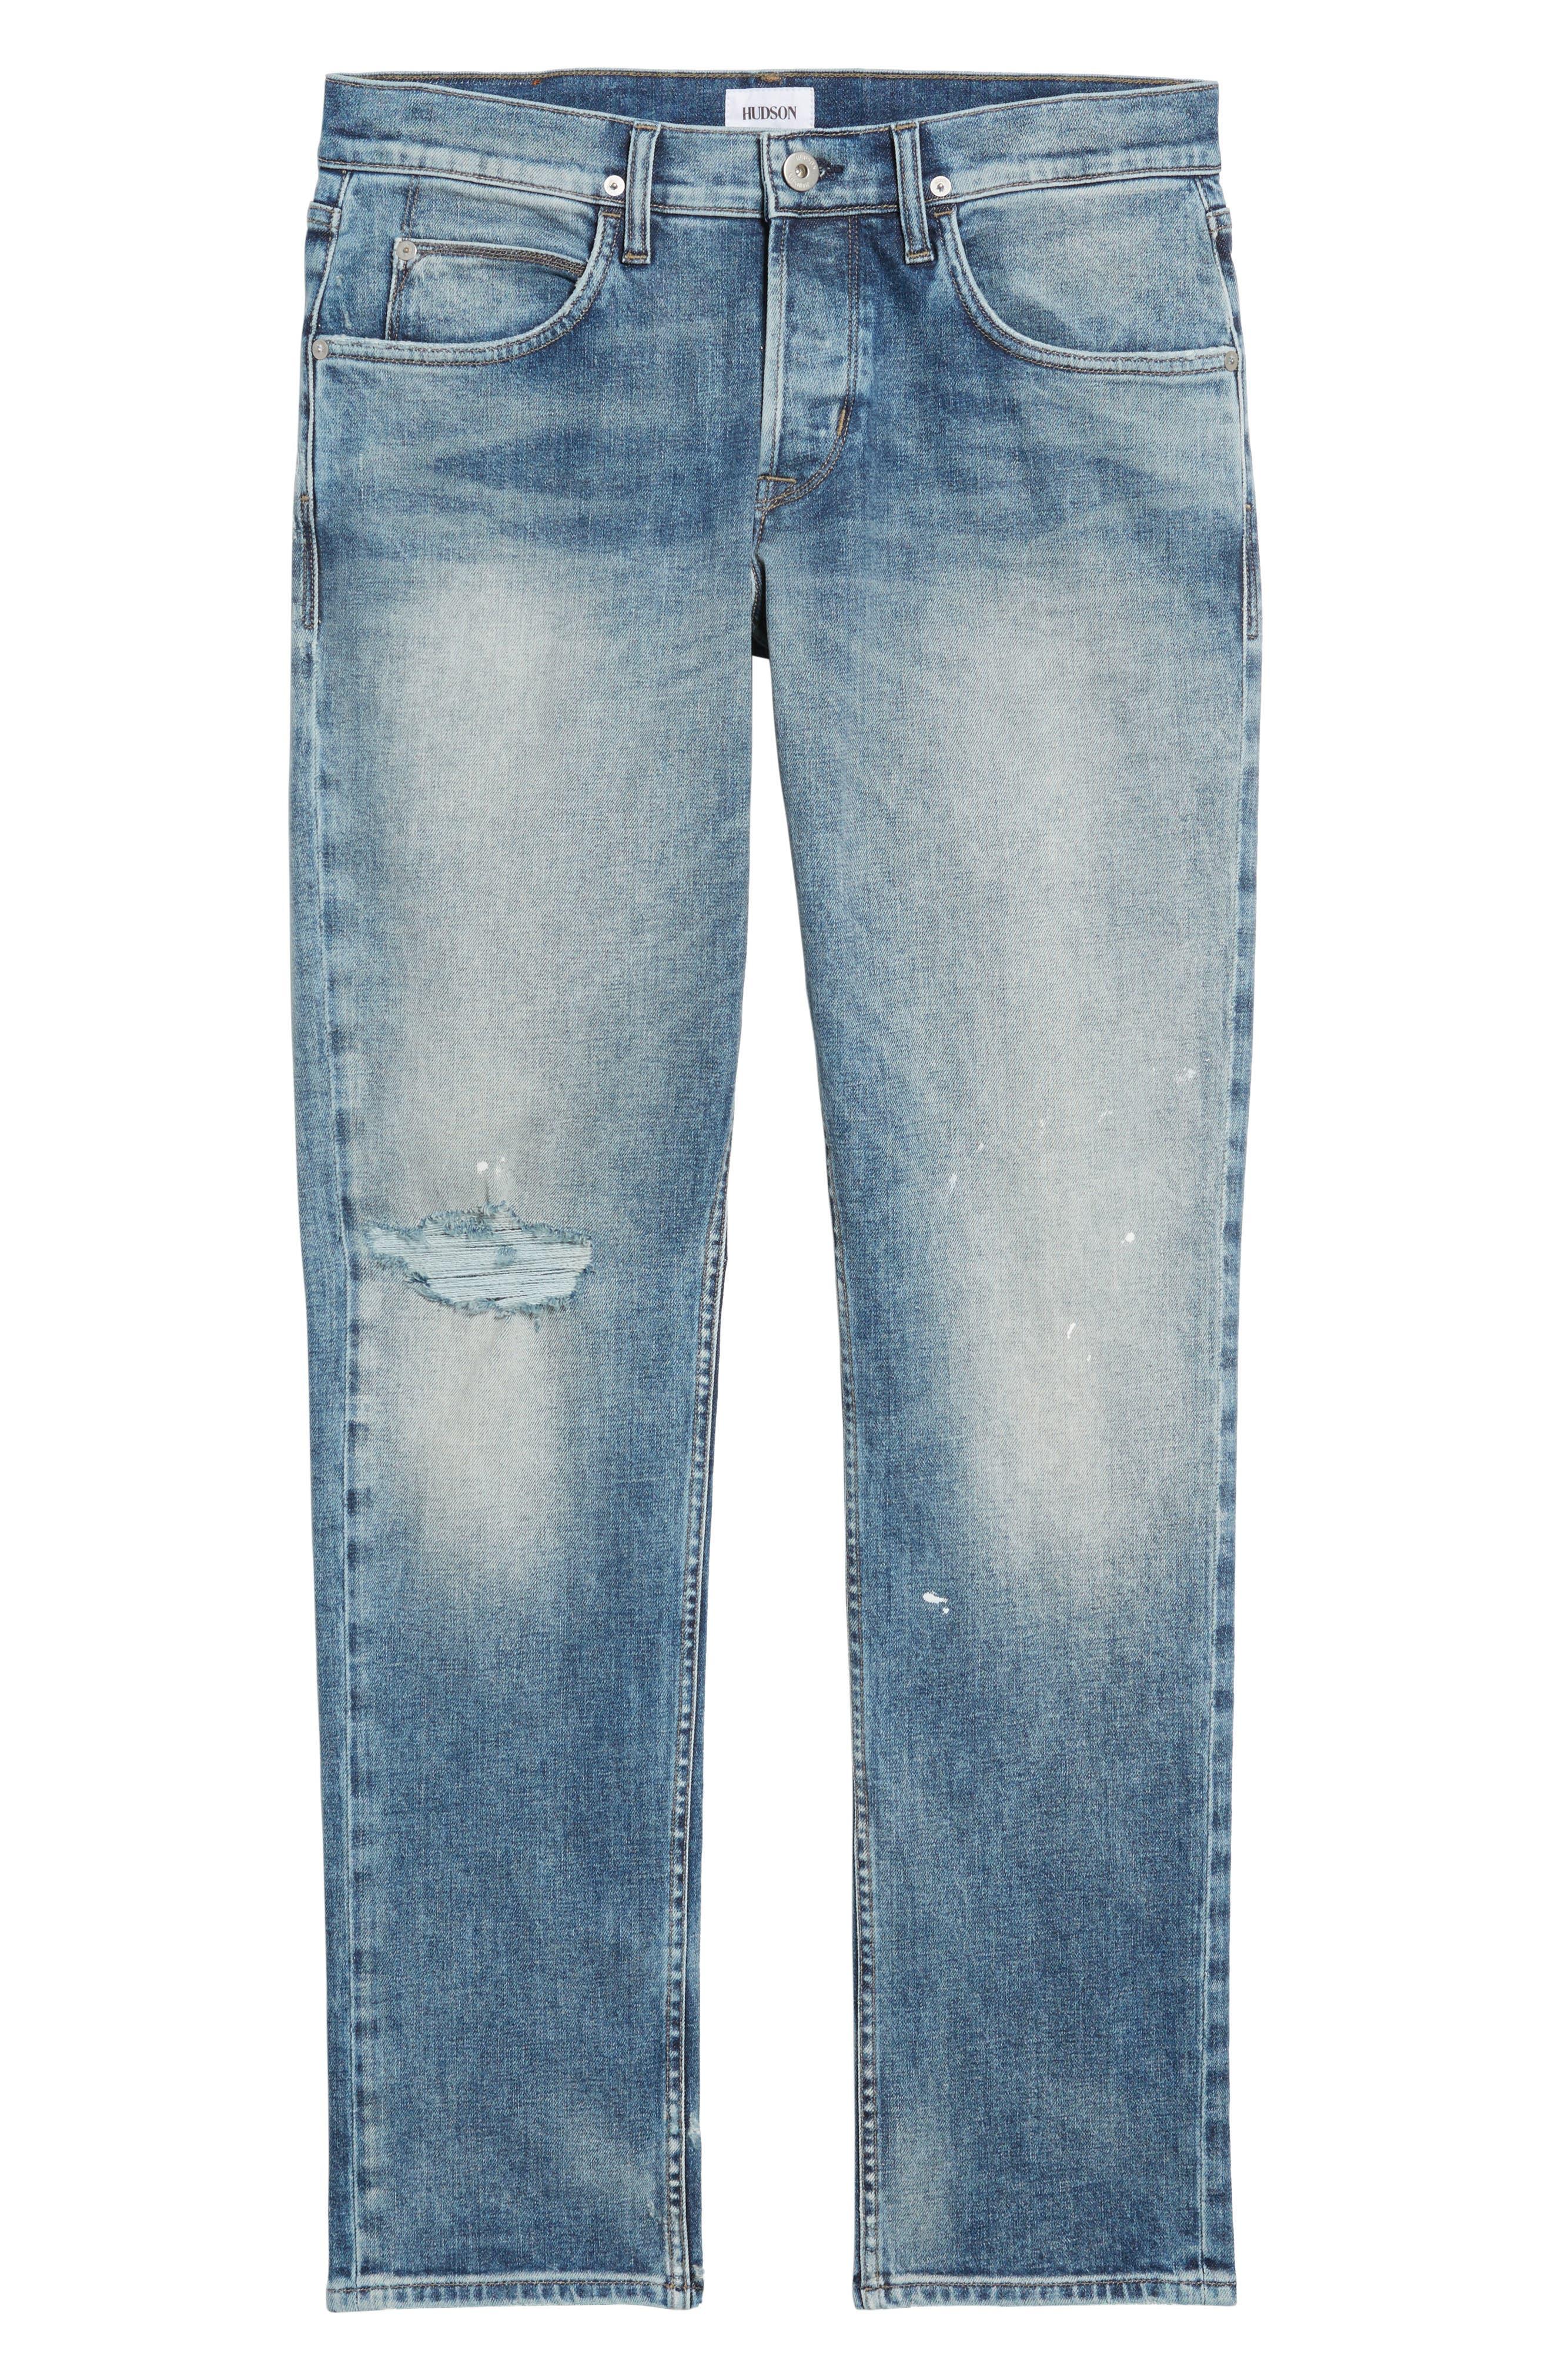 Blake Slim Fit Jeans,                             Alternate thumbnail 6, color,                             Lockwood